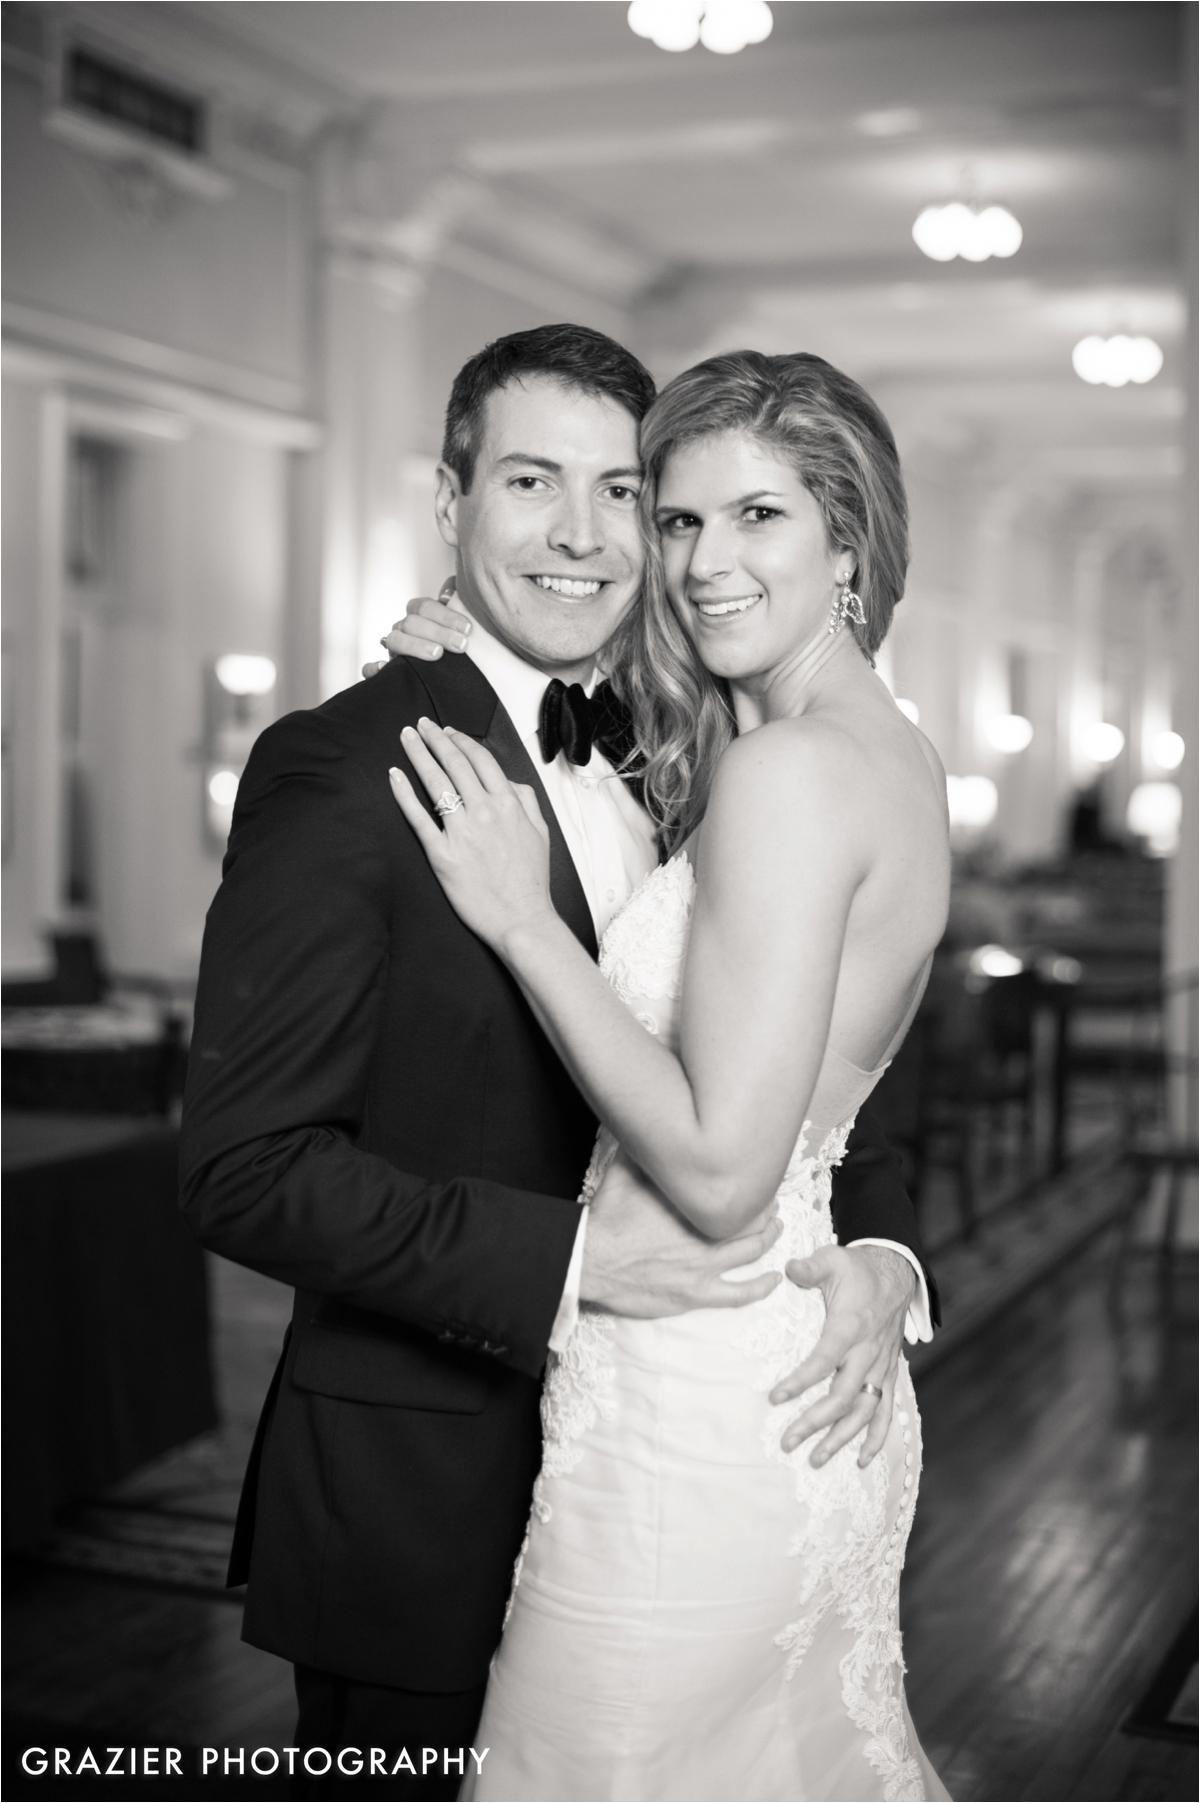 Mount-Washington-Hotel-Wedding-Grazier-Photography_0031.jpg